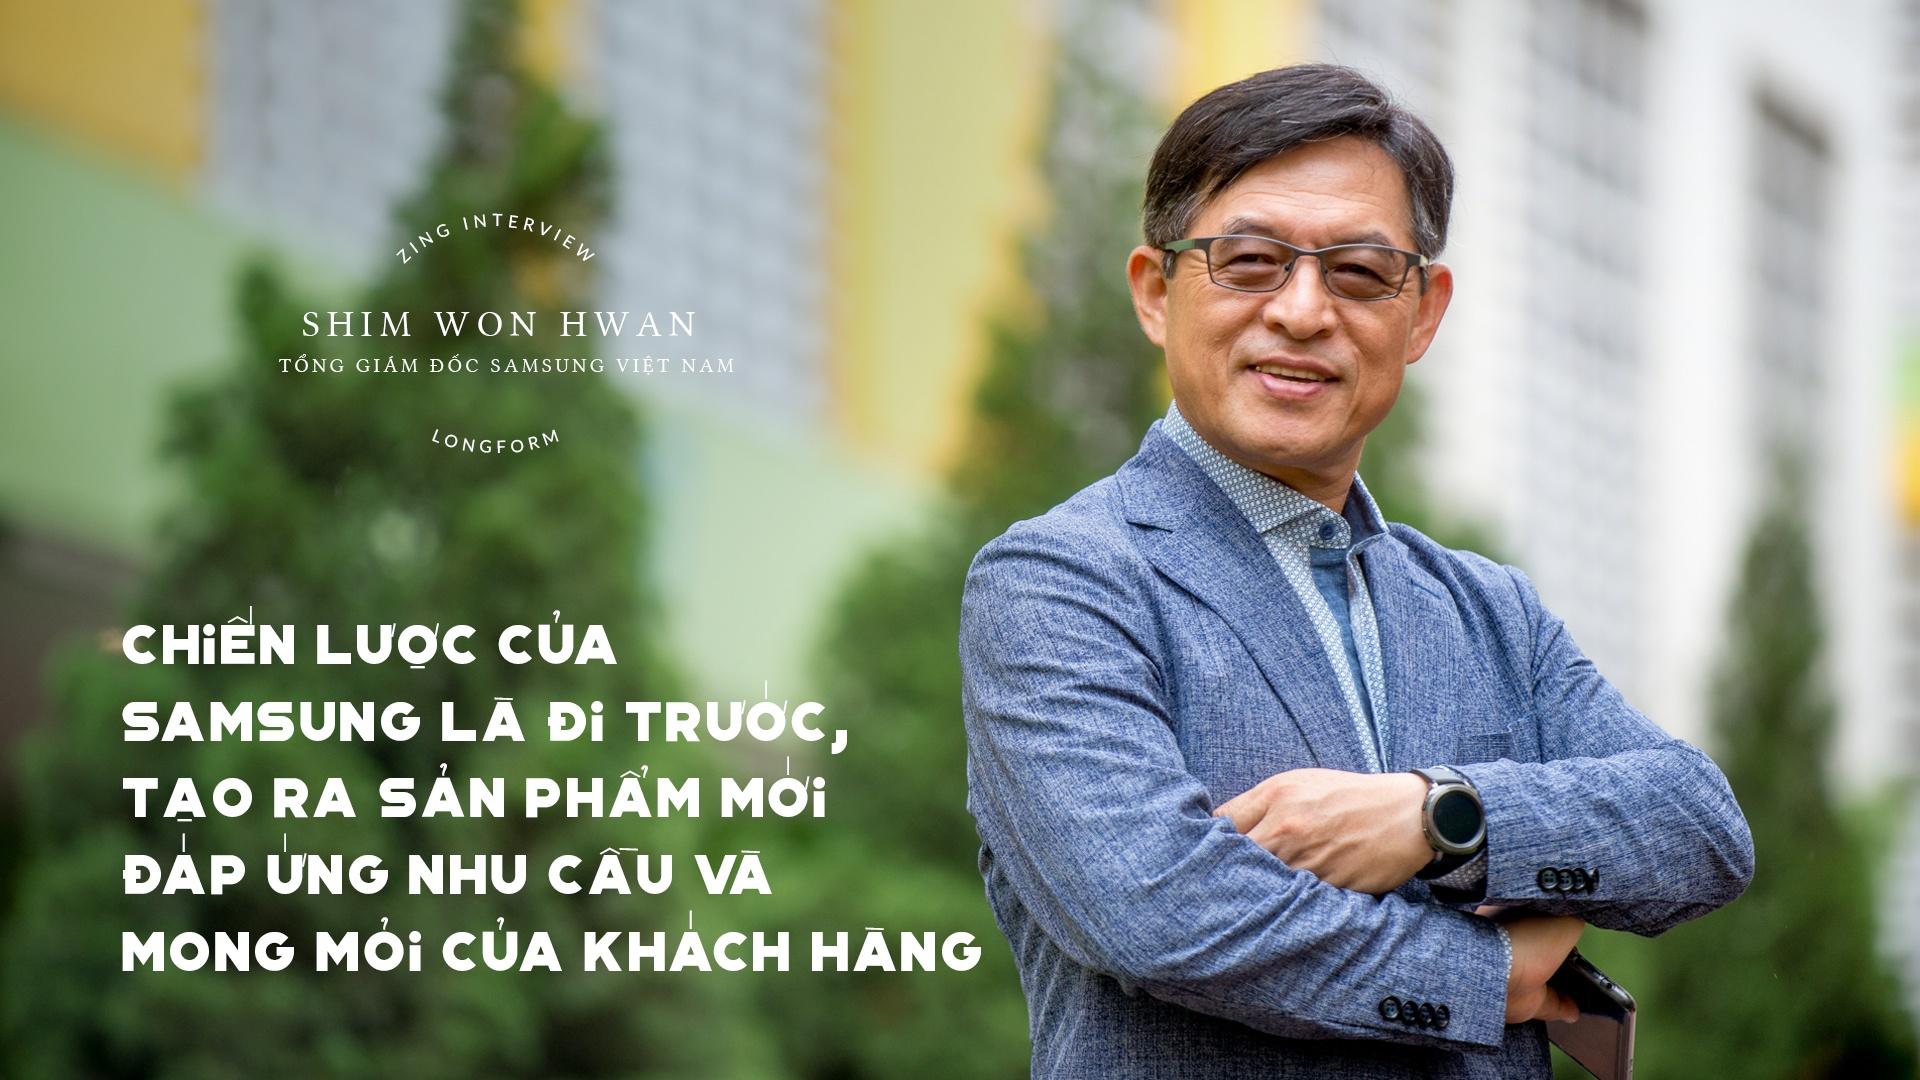 'Nhan vien nguoi Viet lam nen thanh cong cua Samsung Viet Nam' hinh anh 13